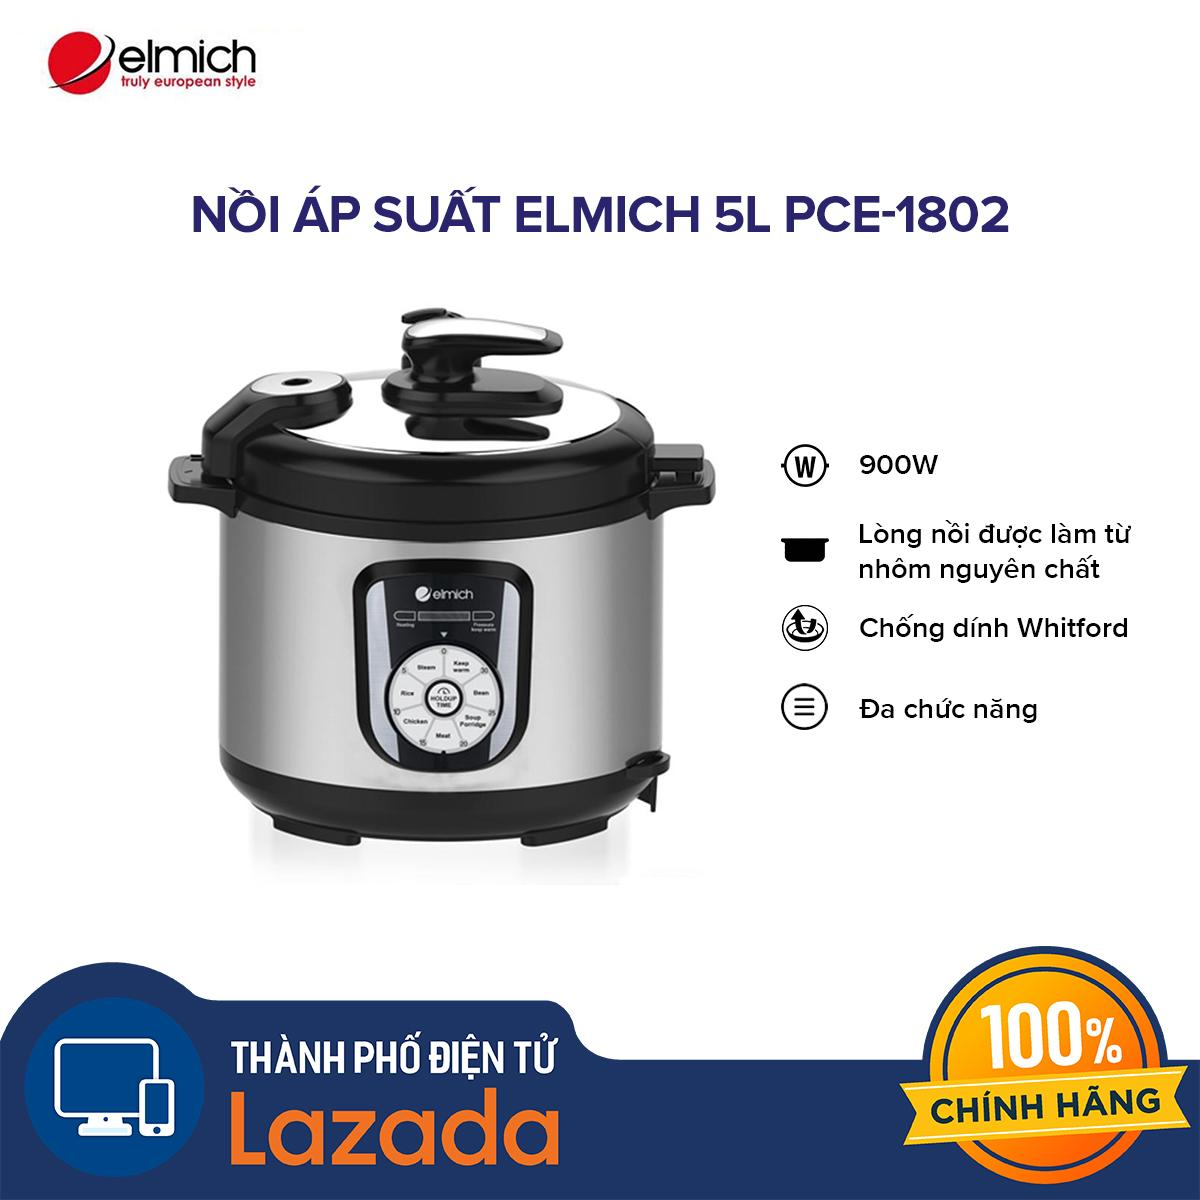 Nồi áp suất Elmich 5L PCE-1802